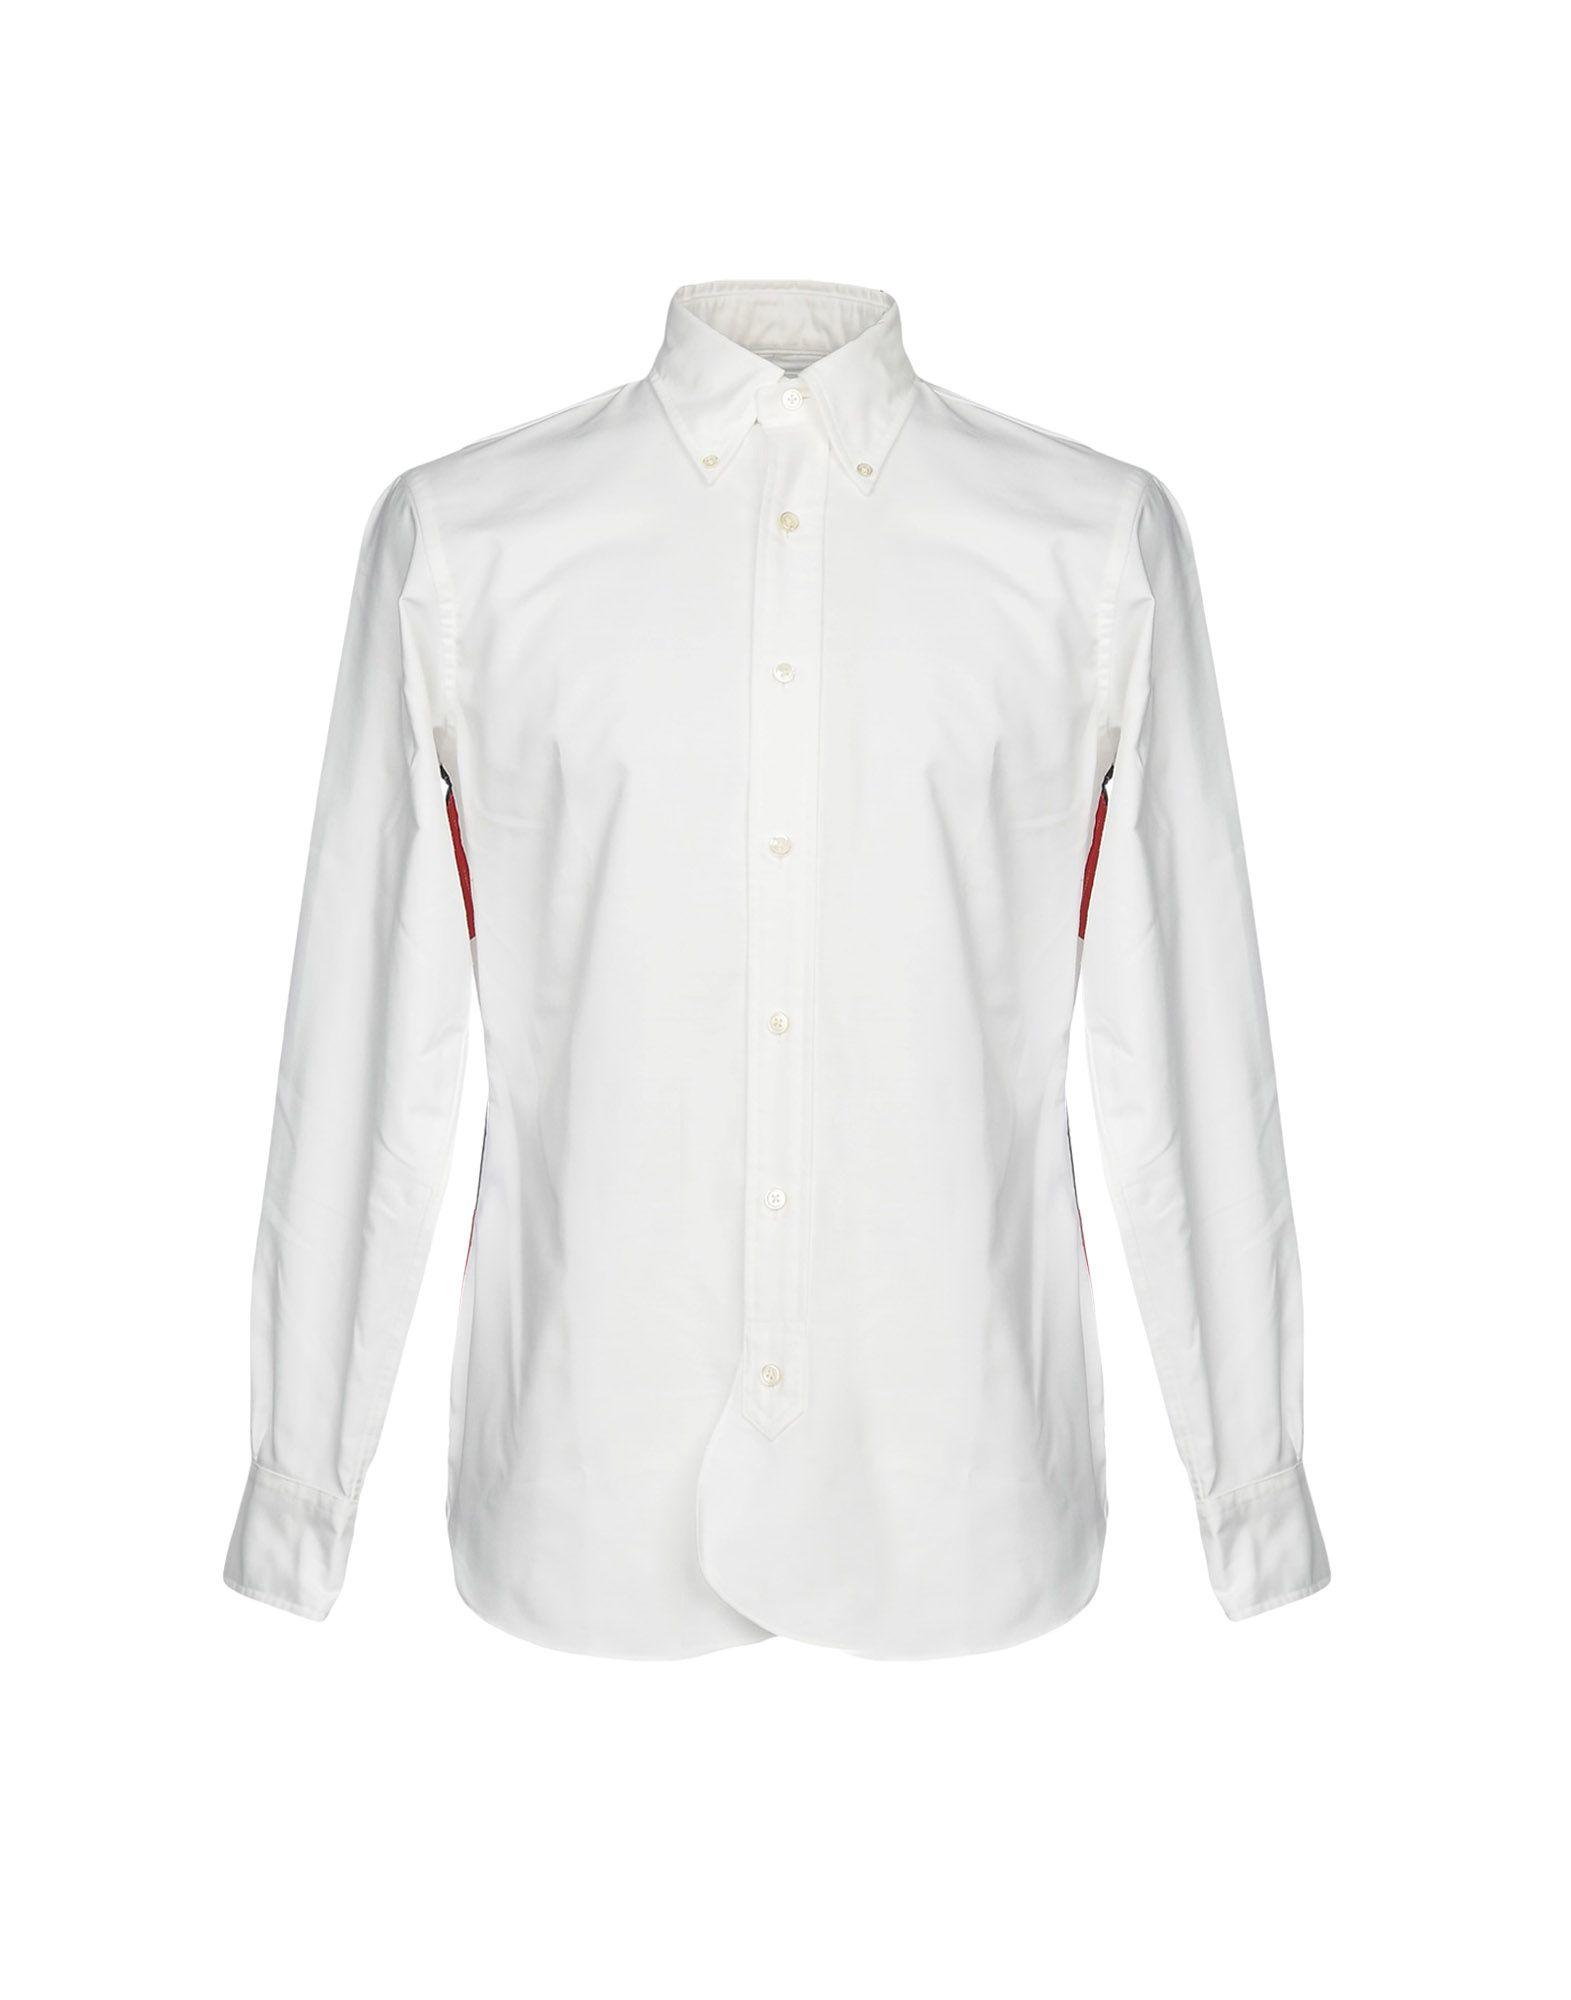 Camicia Tinta Unita Black Fleece By Brooks Brothers Uomo - Acquista online su